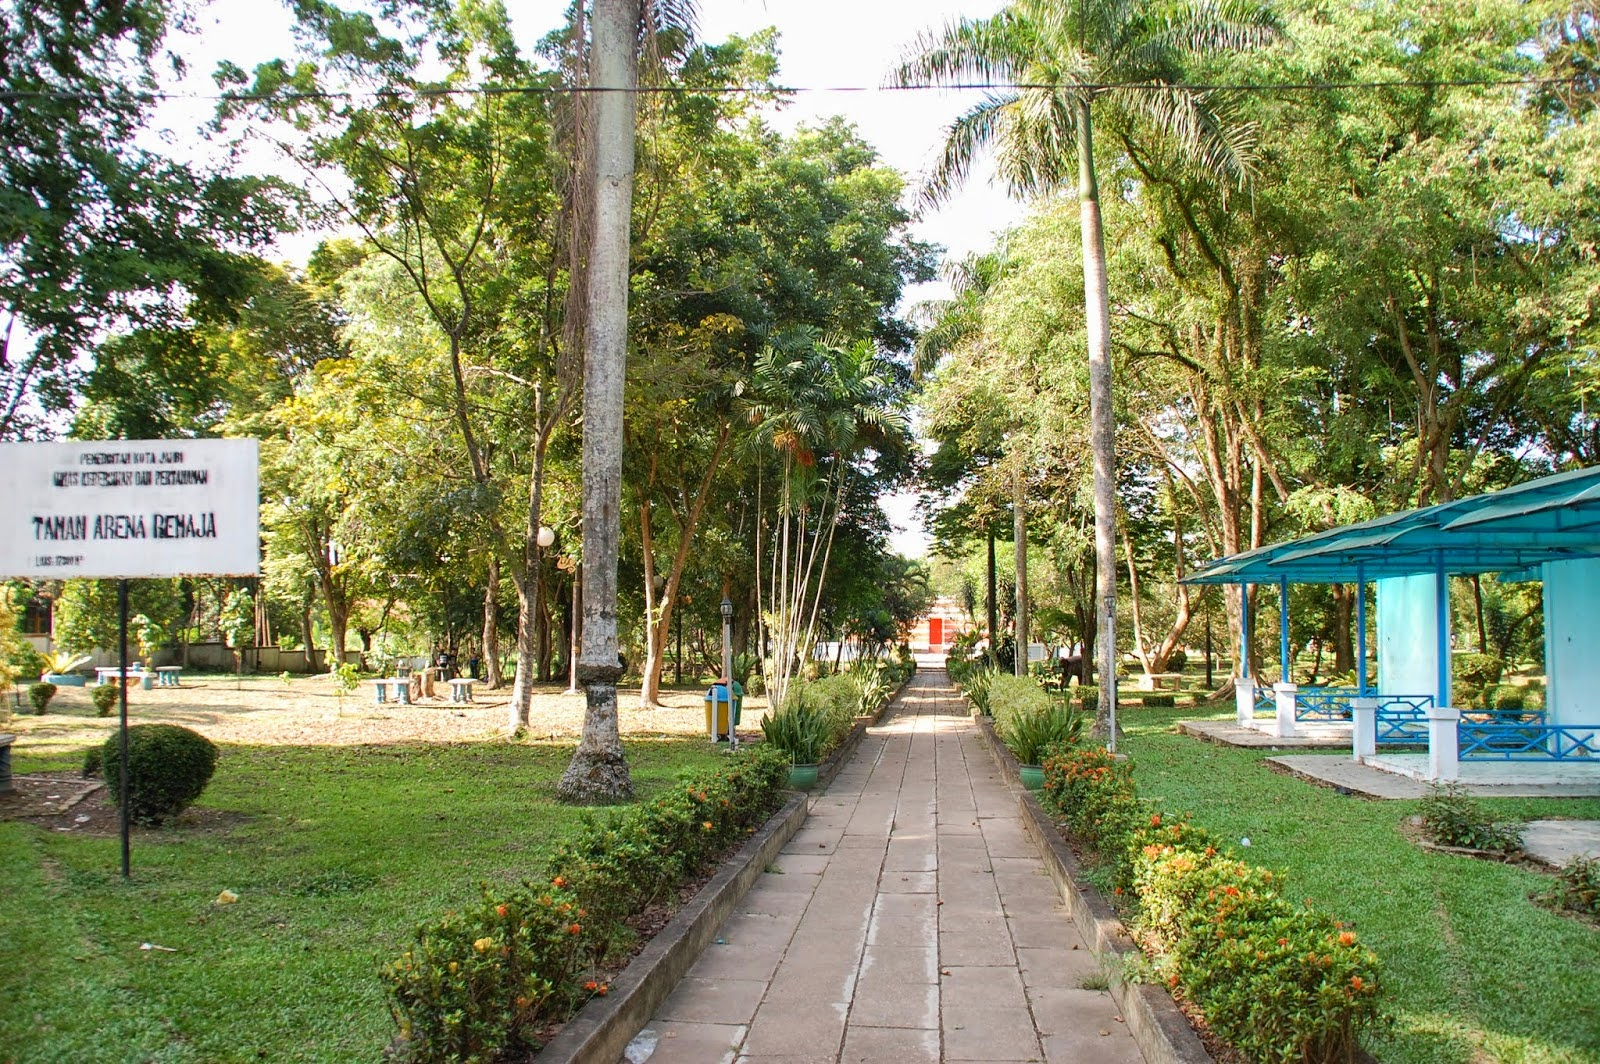 Sepucuk Jambi Sembilan Lurah Destinasi Wisata Kota Taman Remaja Terletak